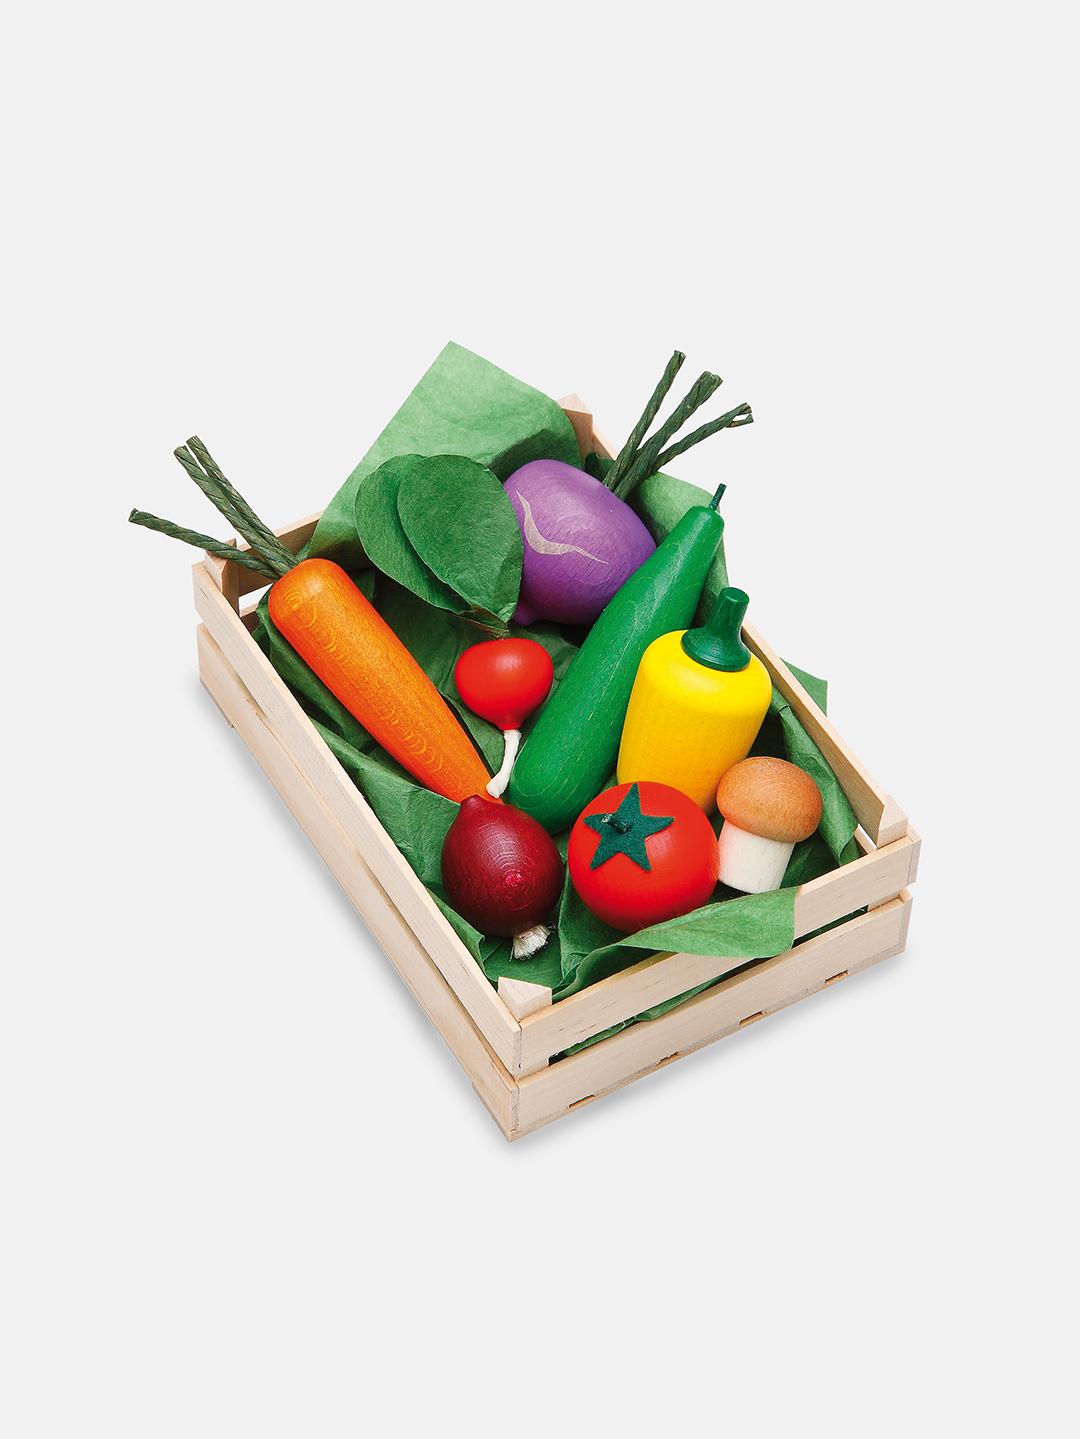 Wooden Vegetables Play Food Set